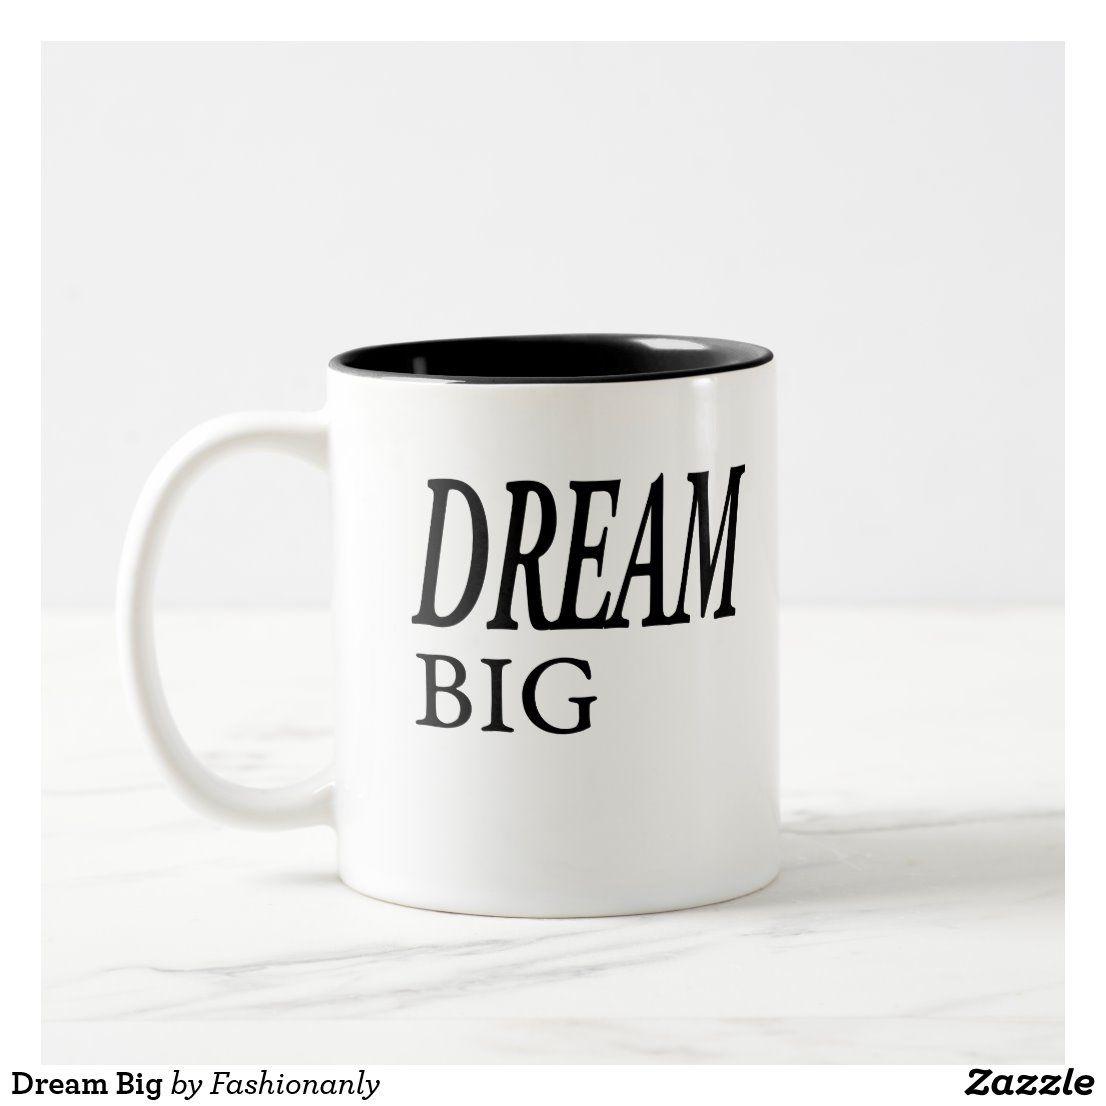 Dream Big Two Tone Coffee Mug In 2020 Dream Big Mugs Coffee Mugs